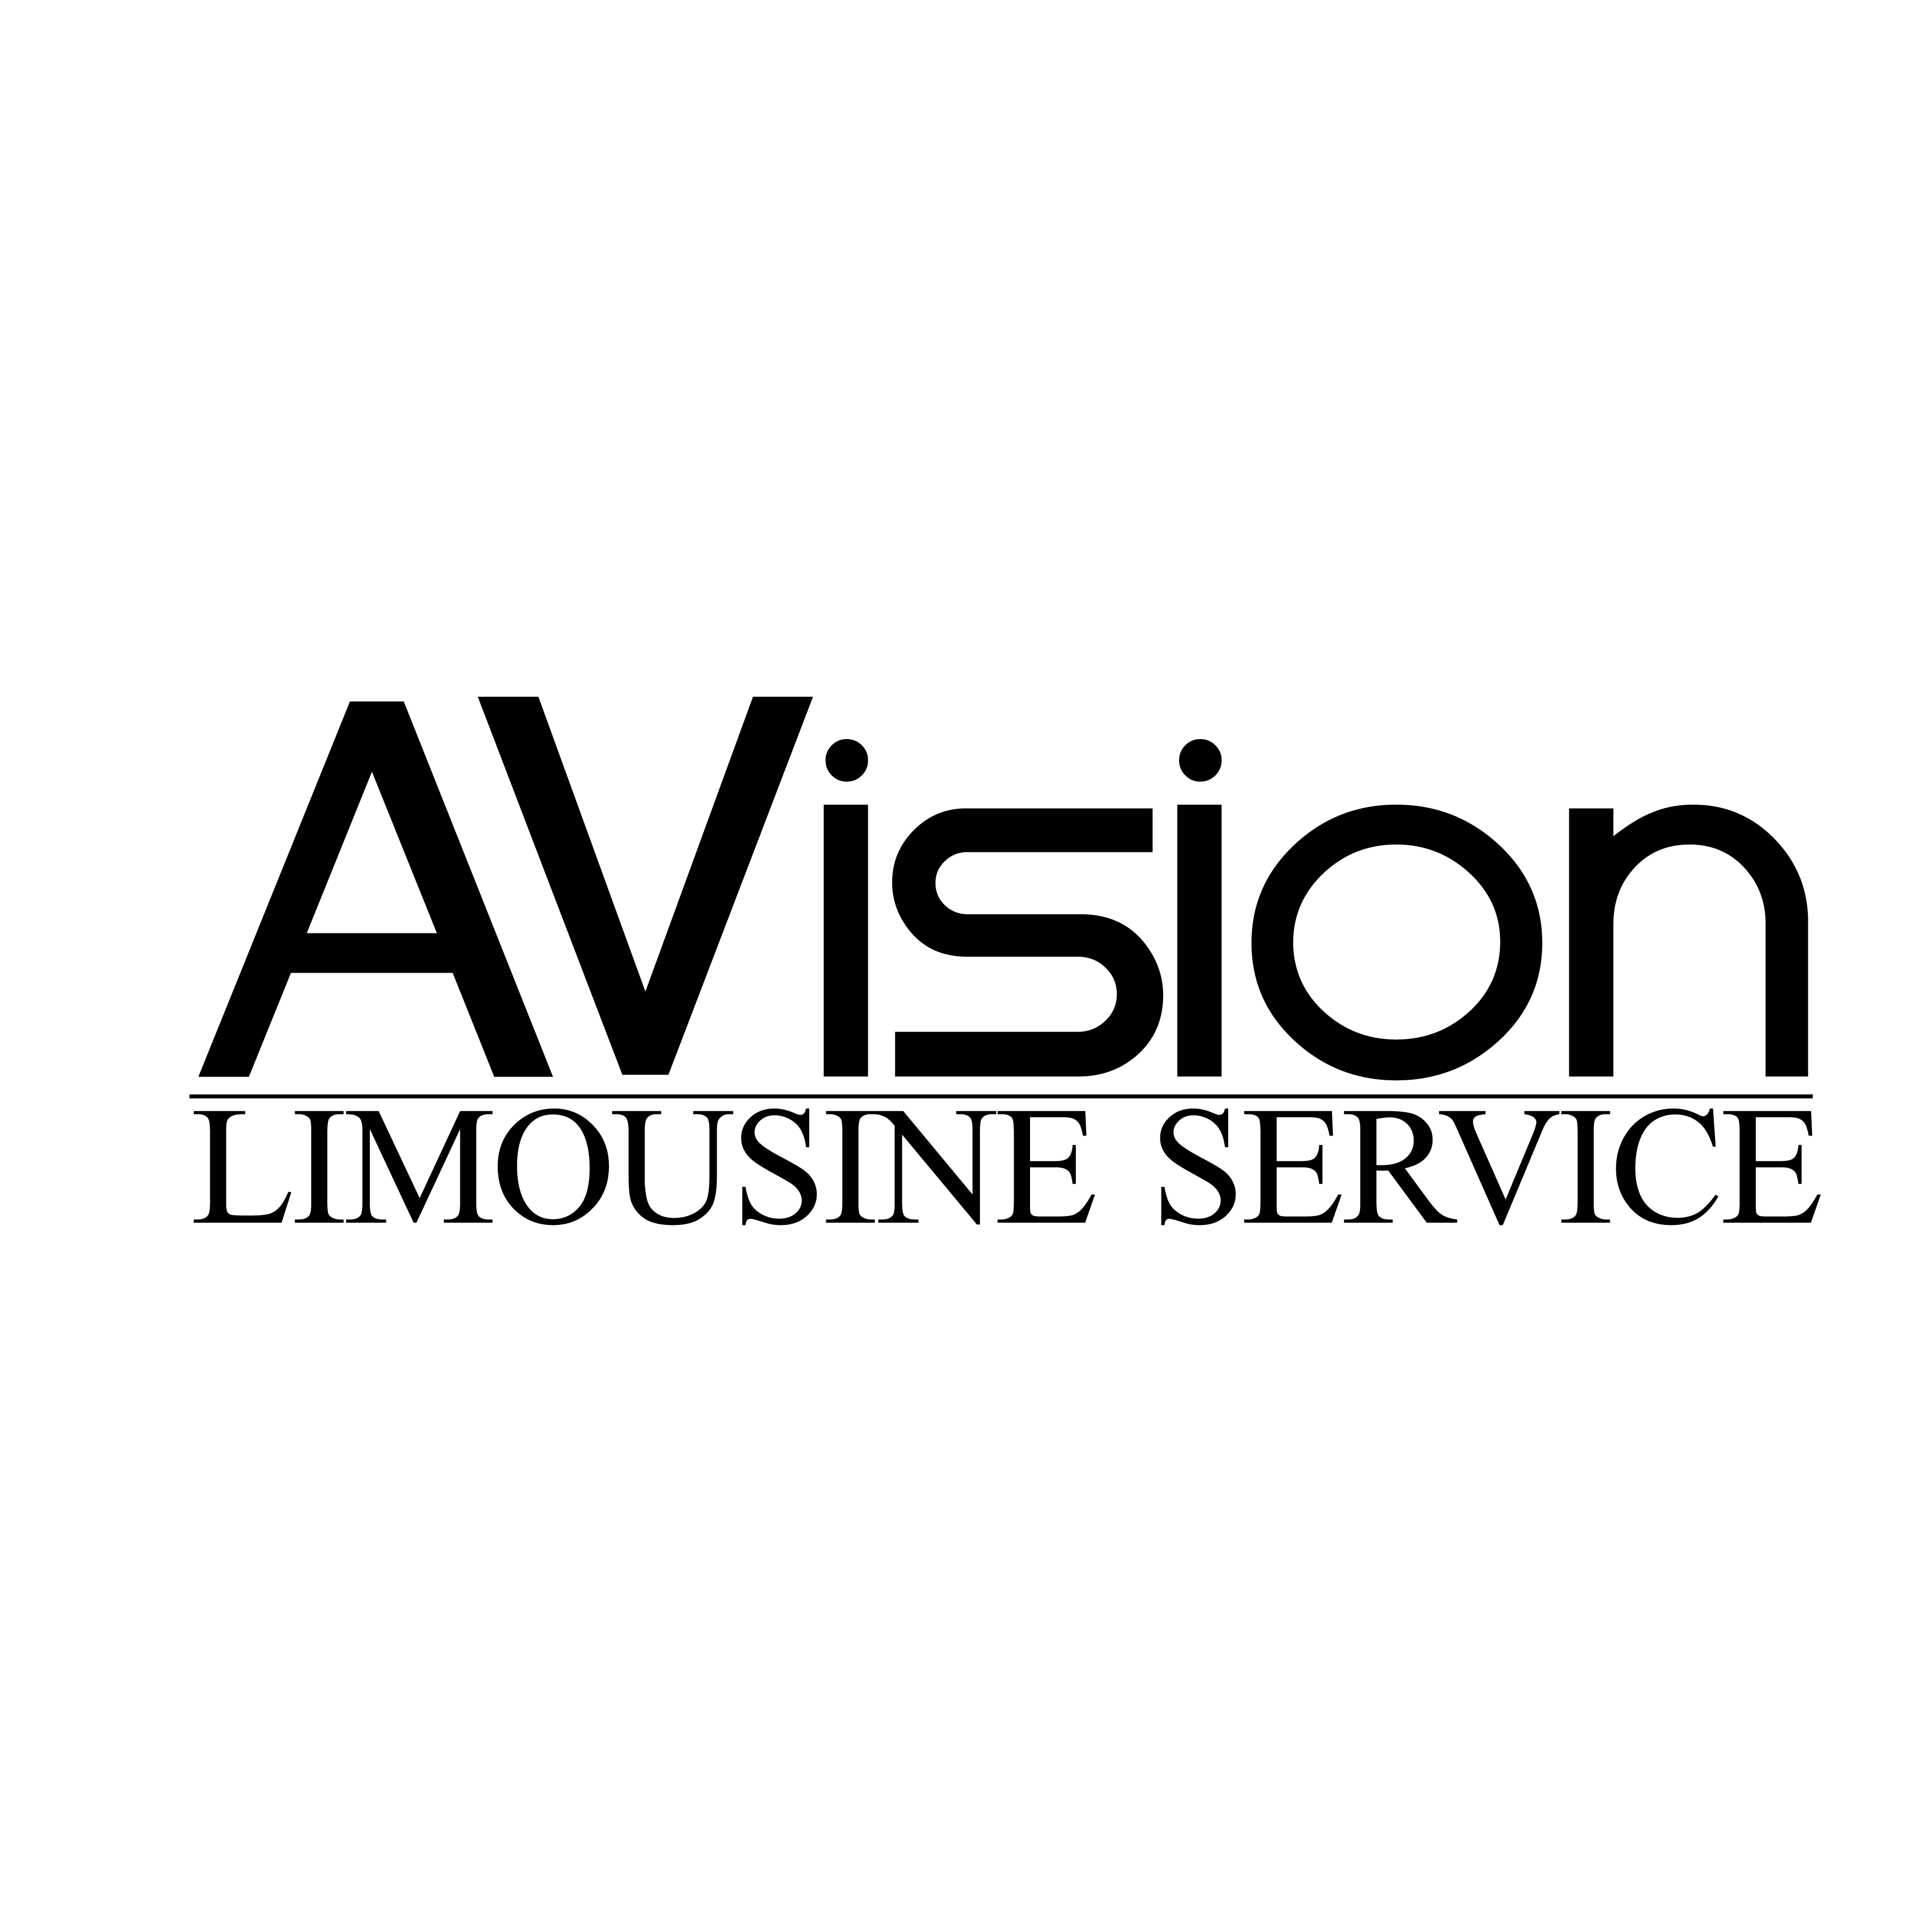 Car Service in TX Richardson 75081 AVision Limousine Services 527 Sterling Drive (972)725-7449